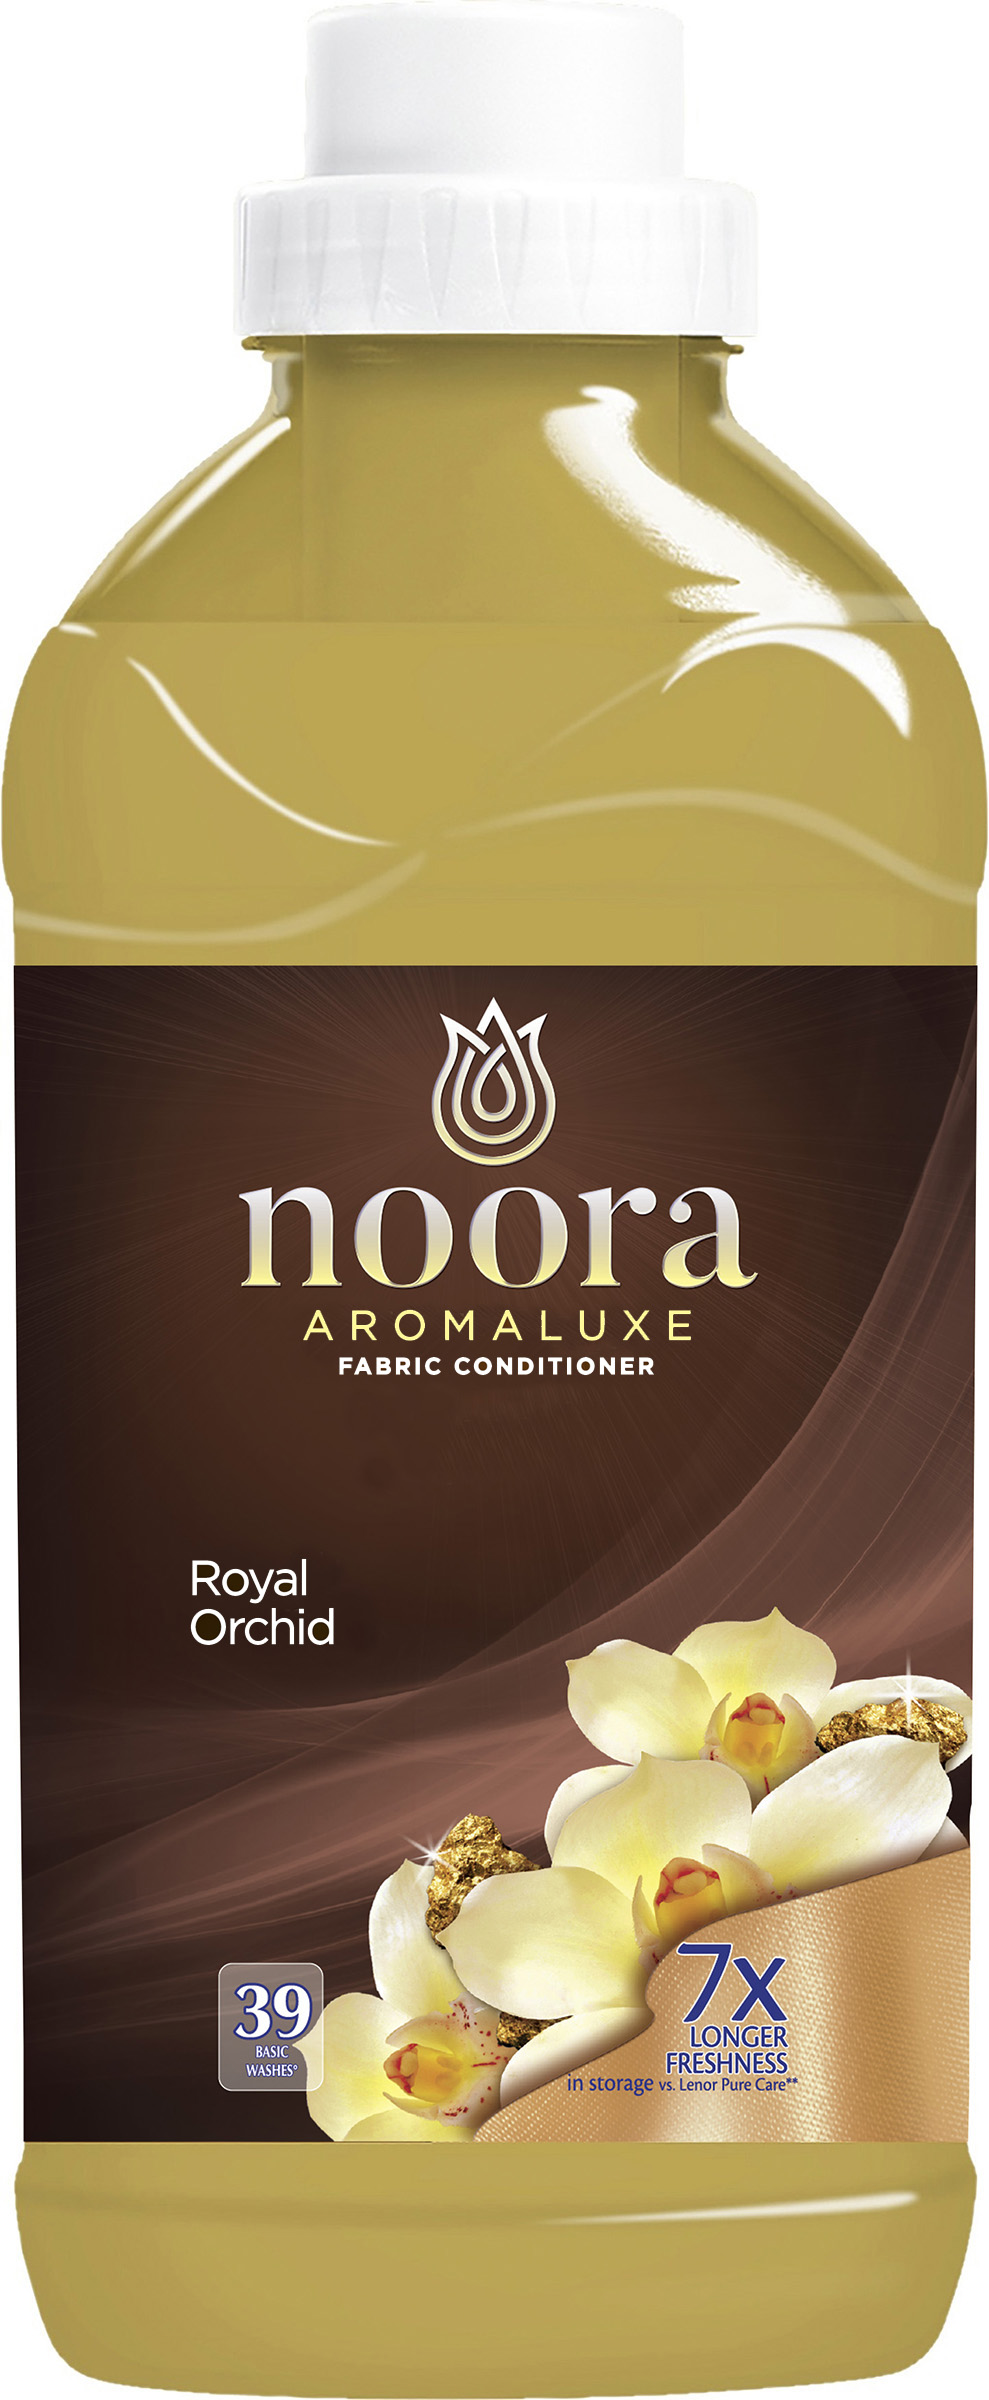 50526 Noora Royal Orchid 550ml